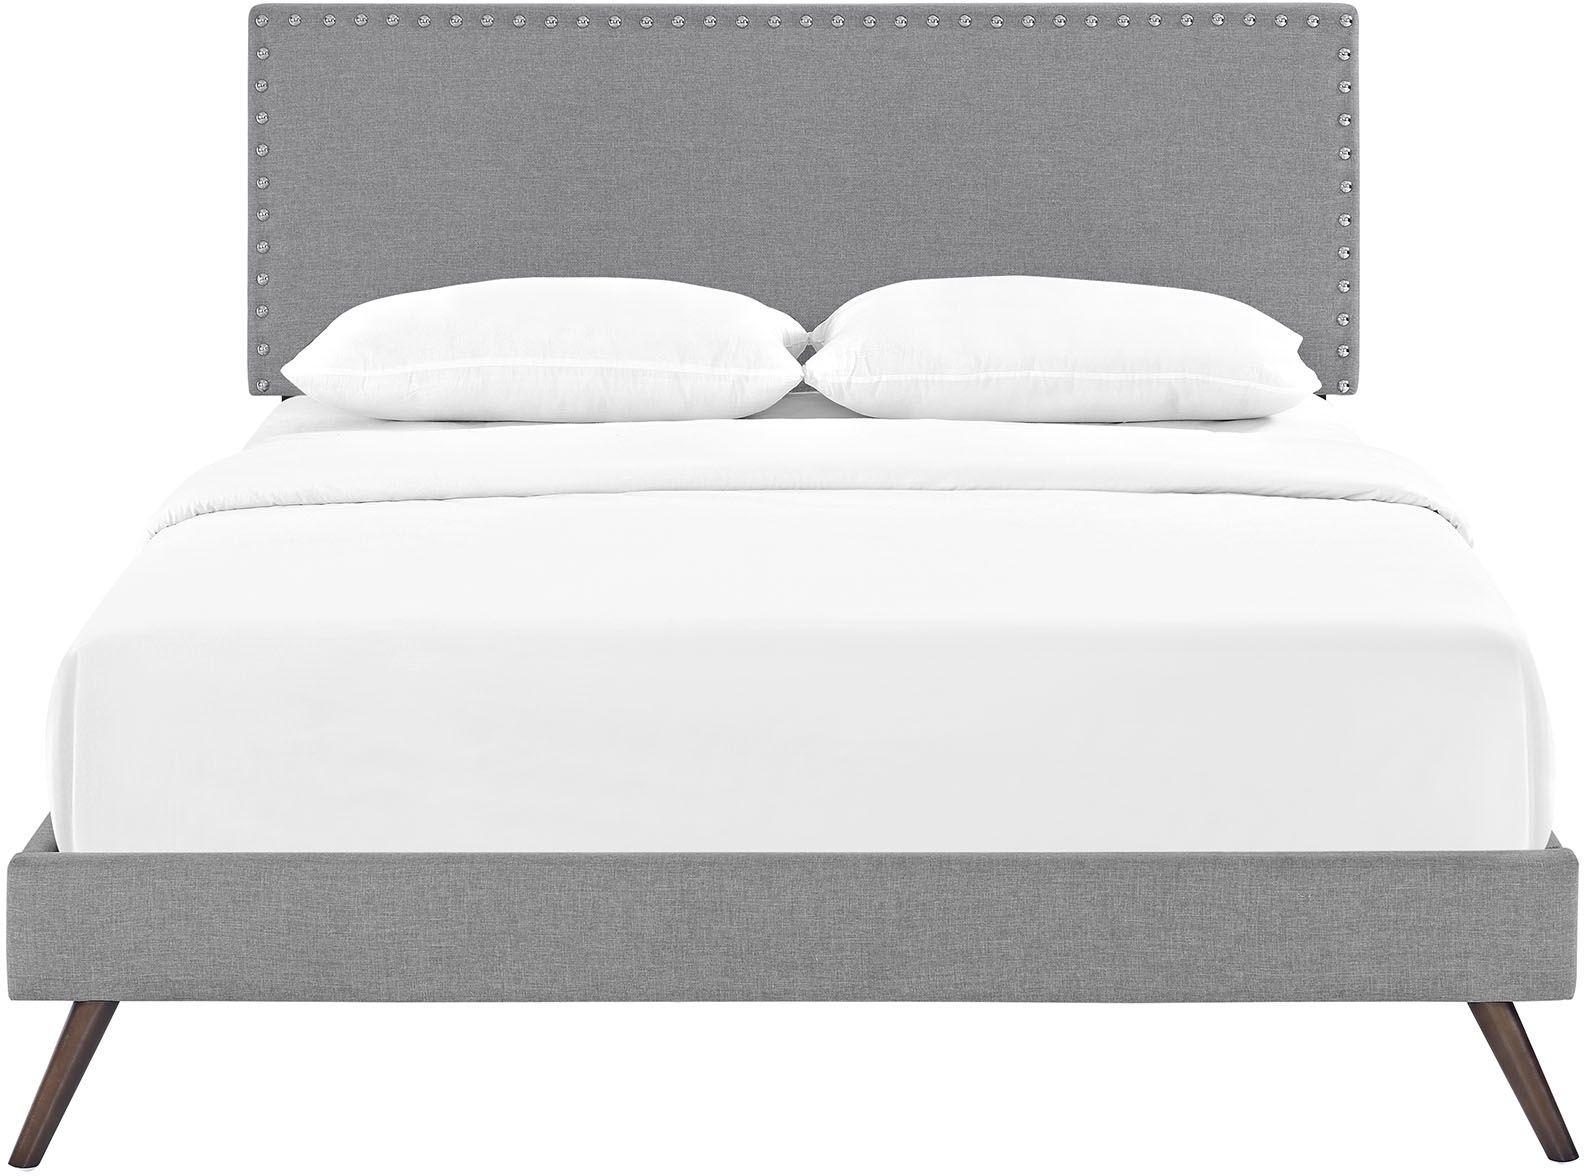 Phoebe Light Gray Full Upholstered Platform Bed With Round